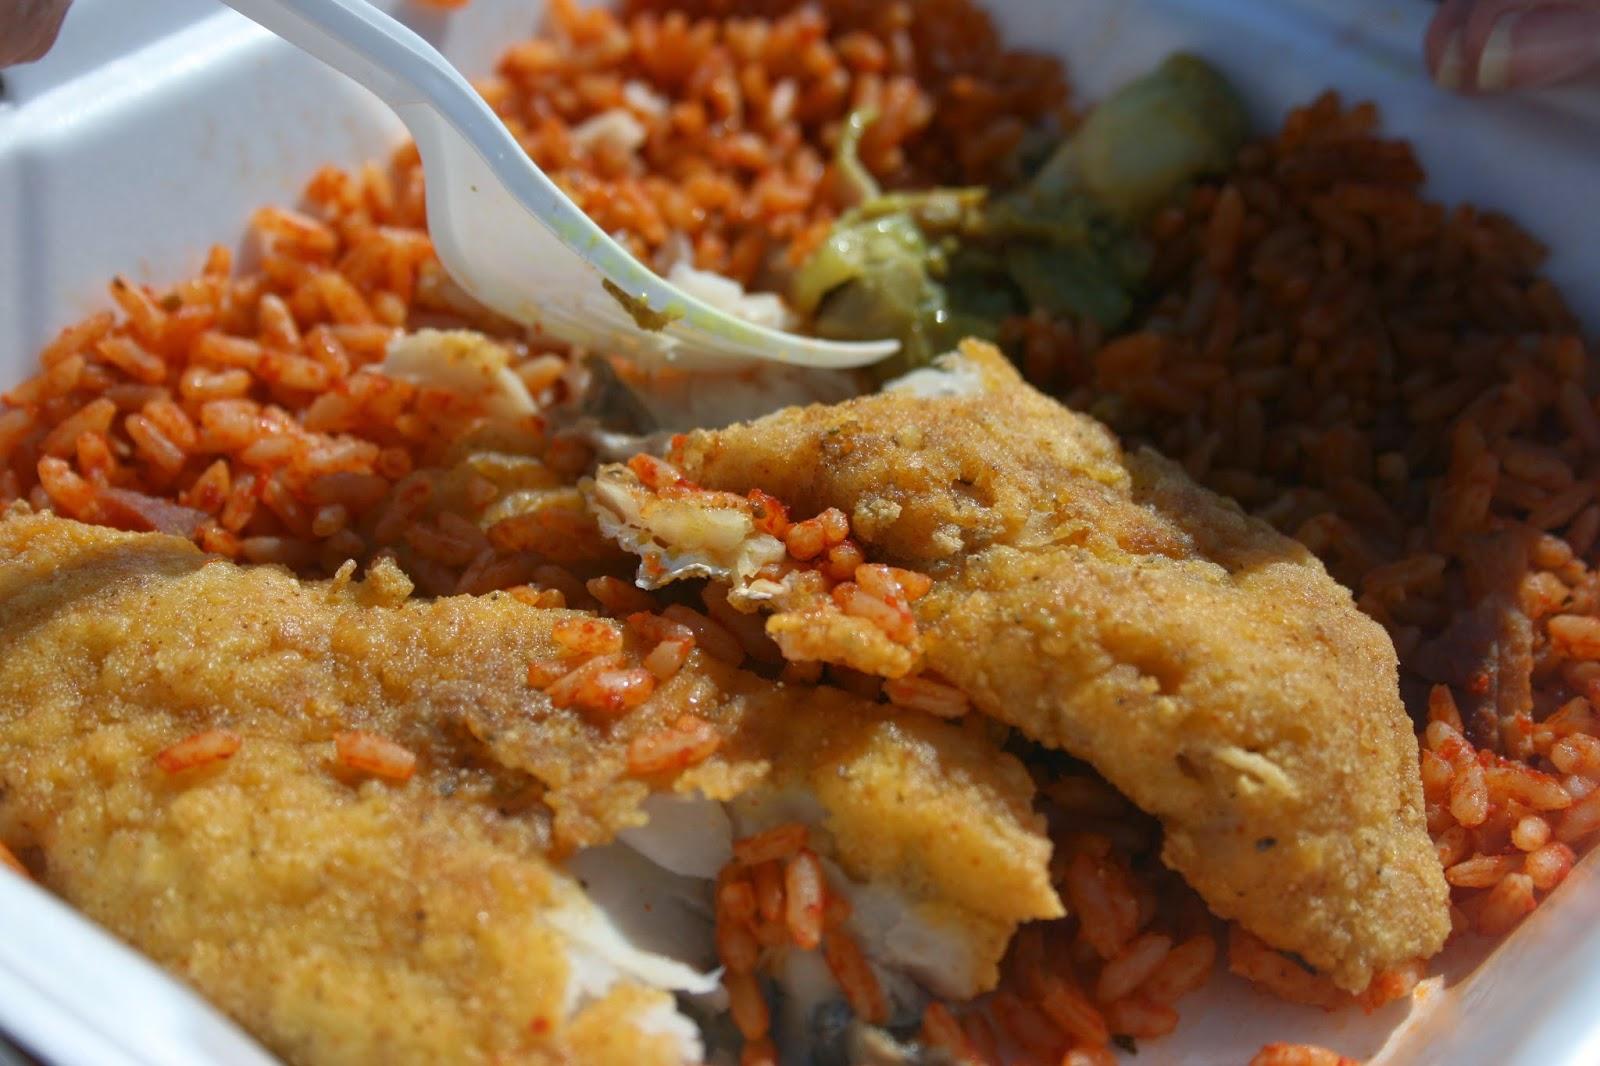 Gullah cuisine